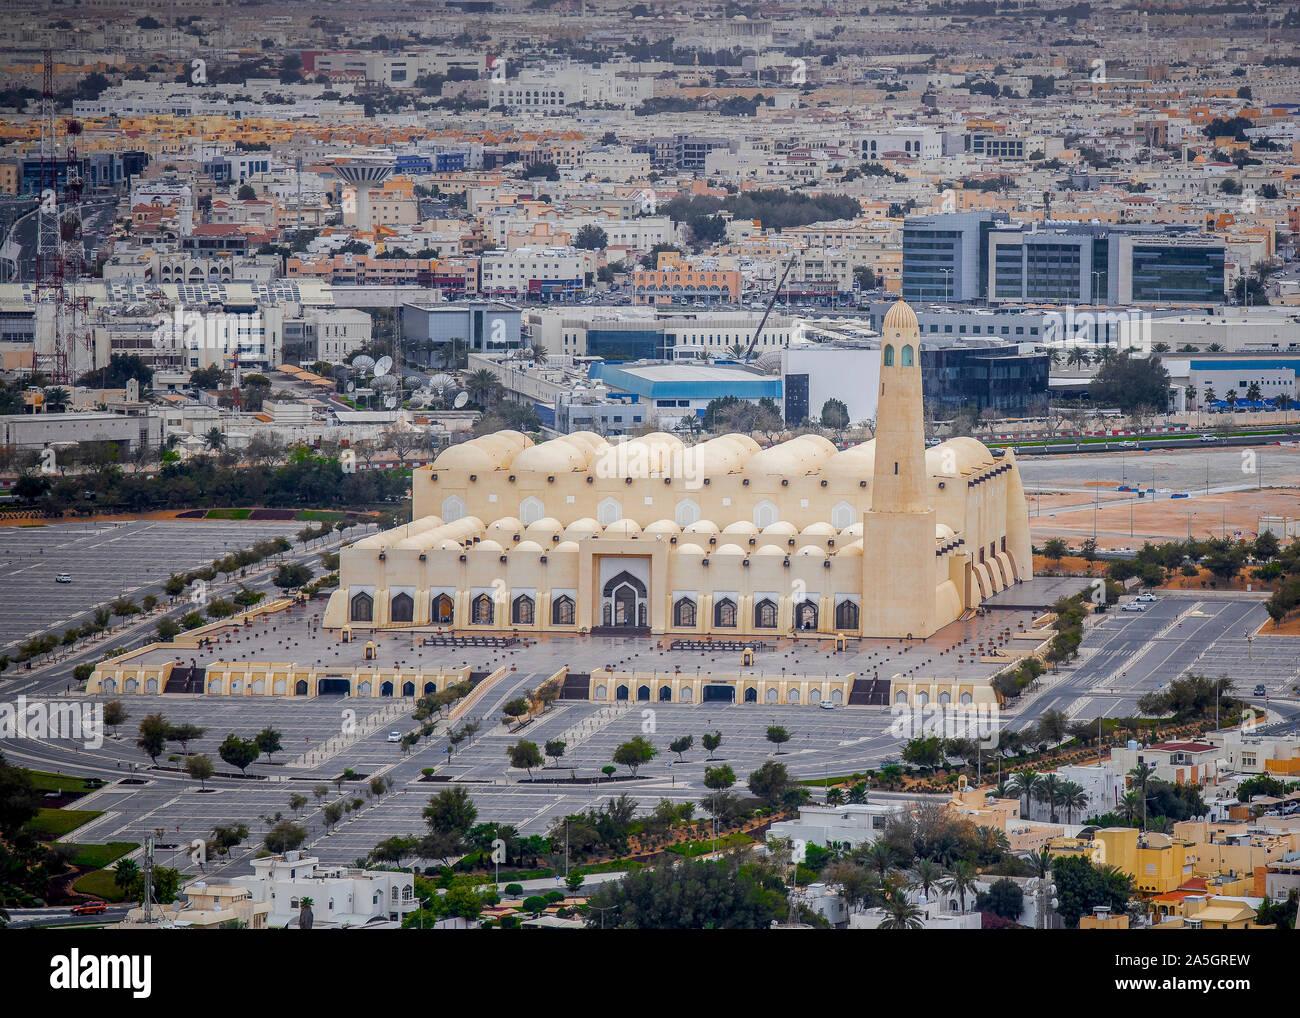 Grand Mosque Abdul Wahab Doha Stock Photo - Alamy